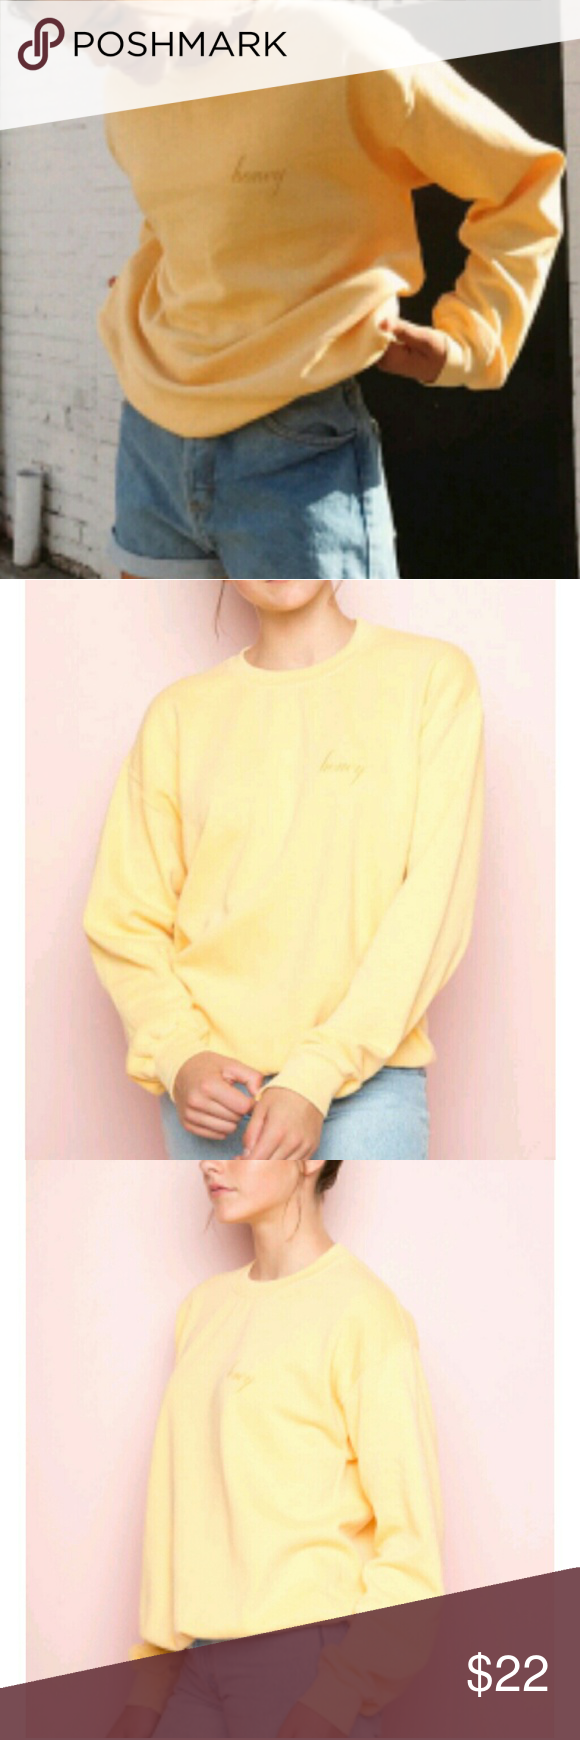 Brandymelville Embroidered Honeysweatshirt M My Posh Picks